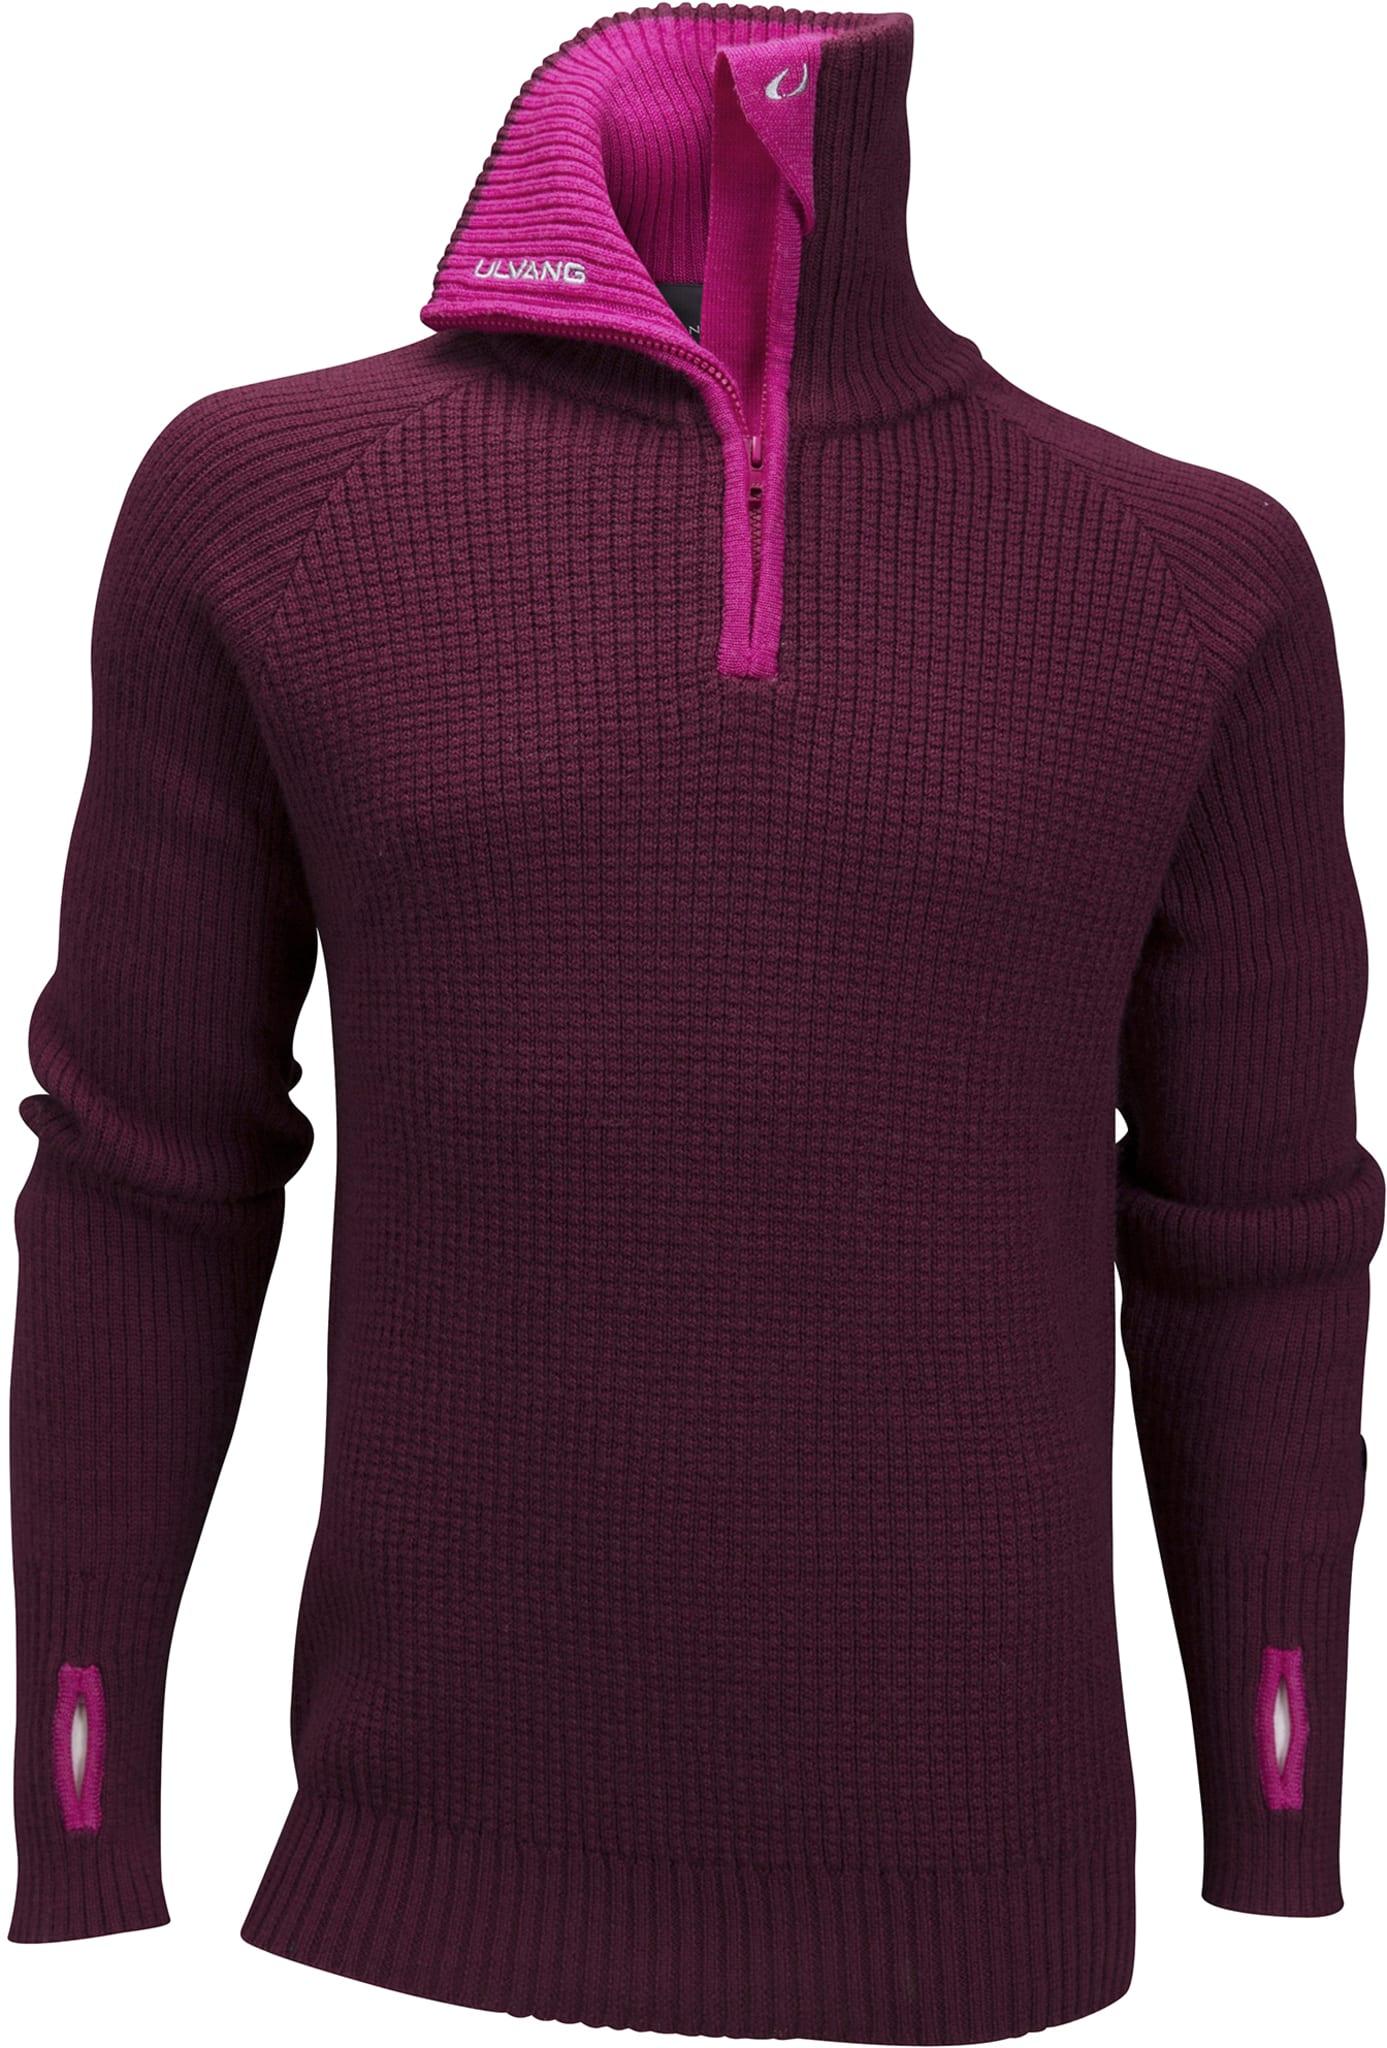 Rav Sweater